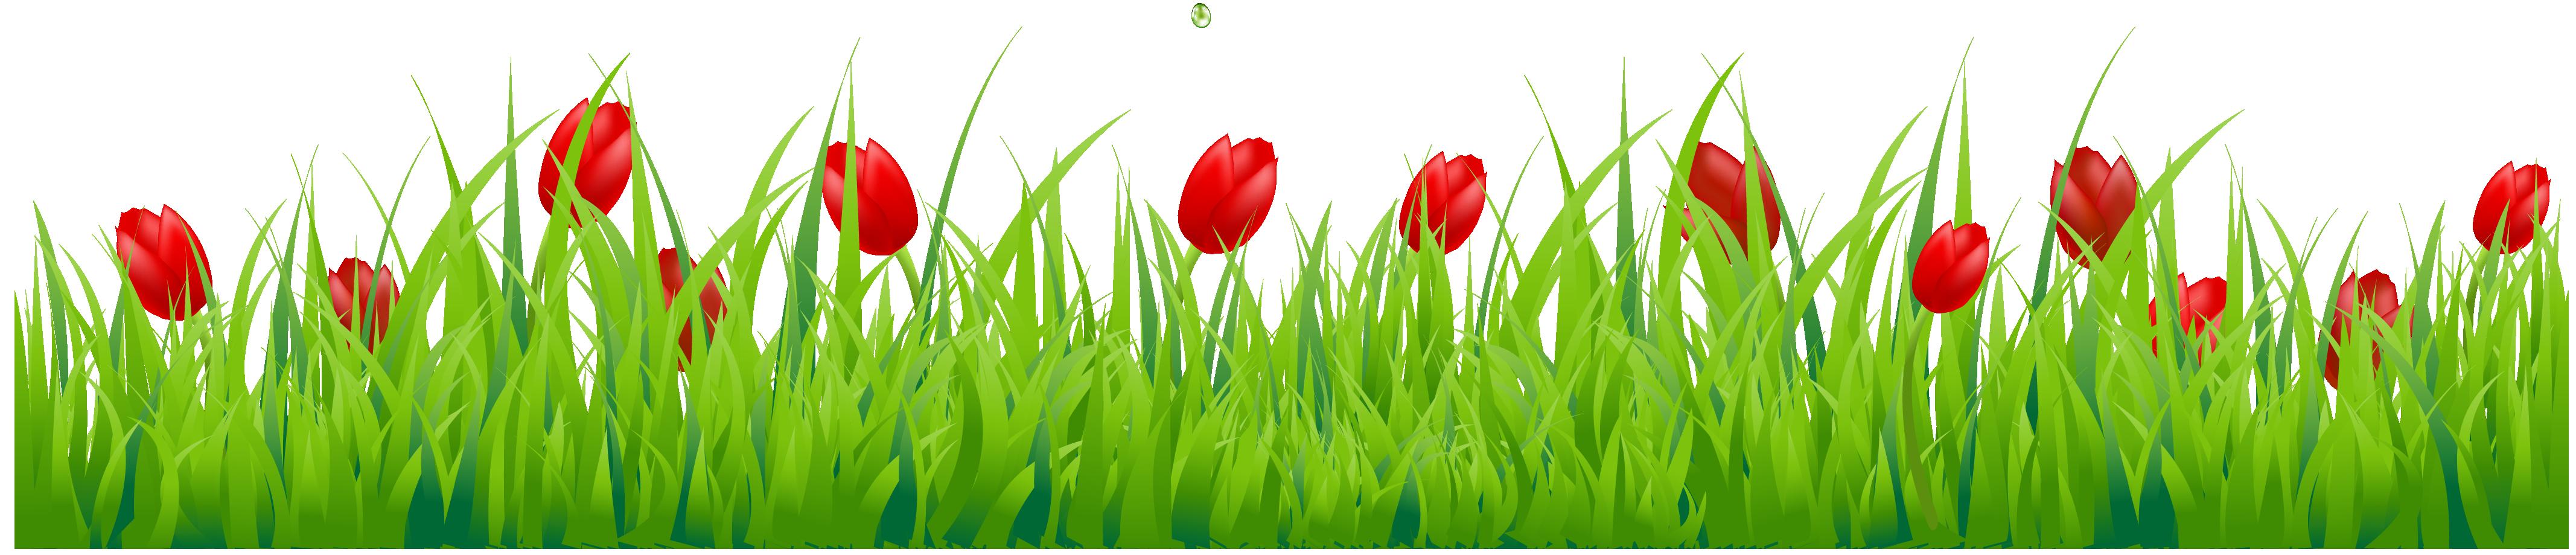 Grass clip art images free clipart